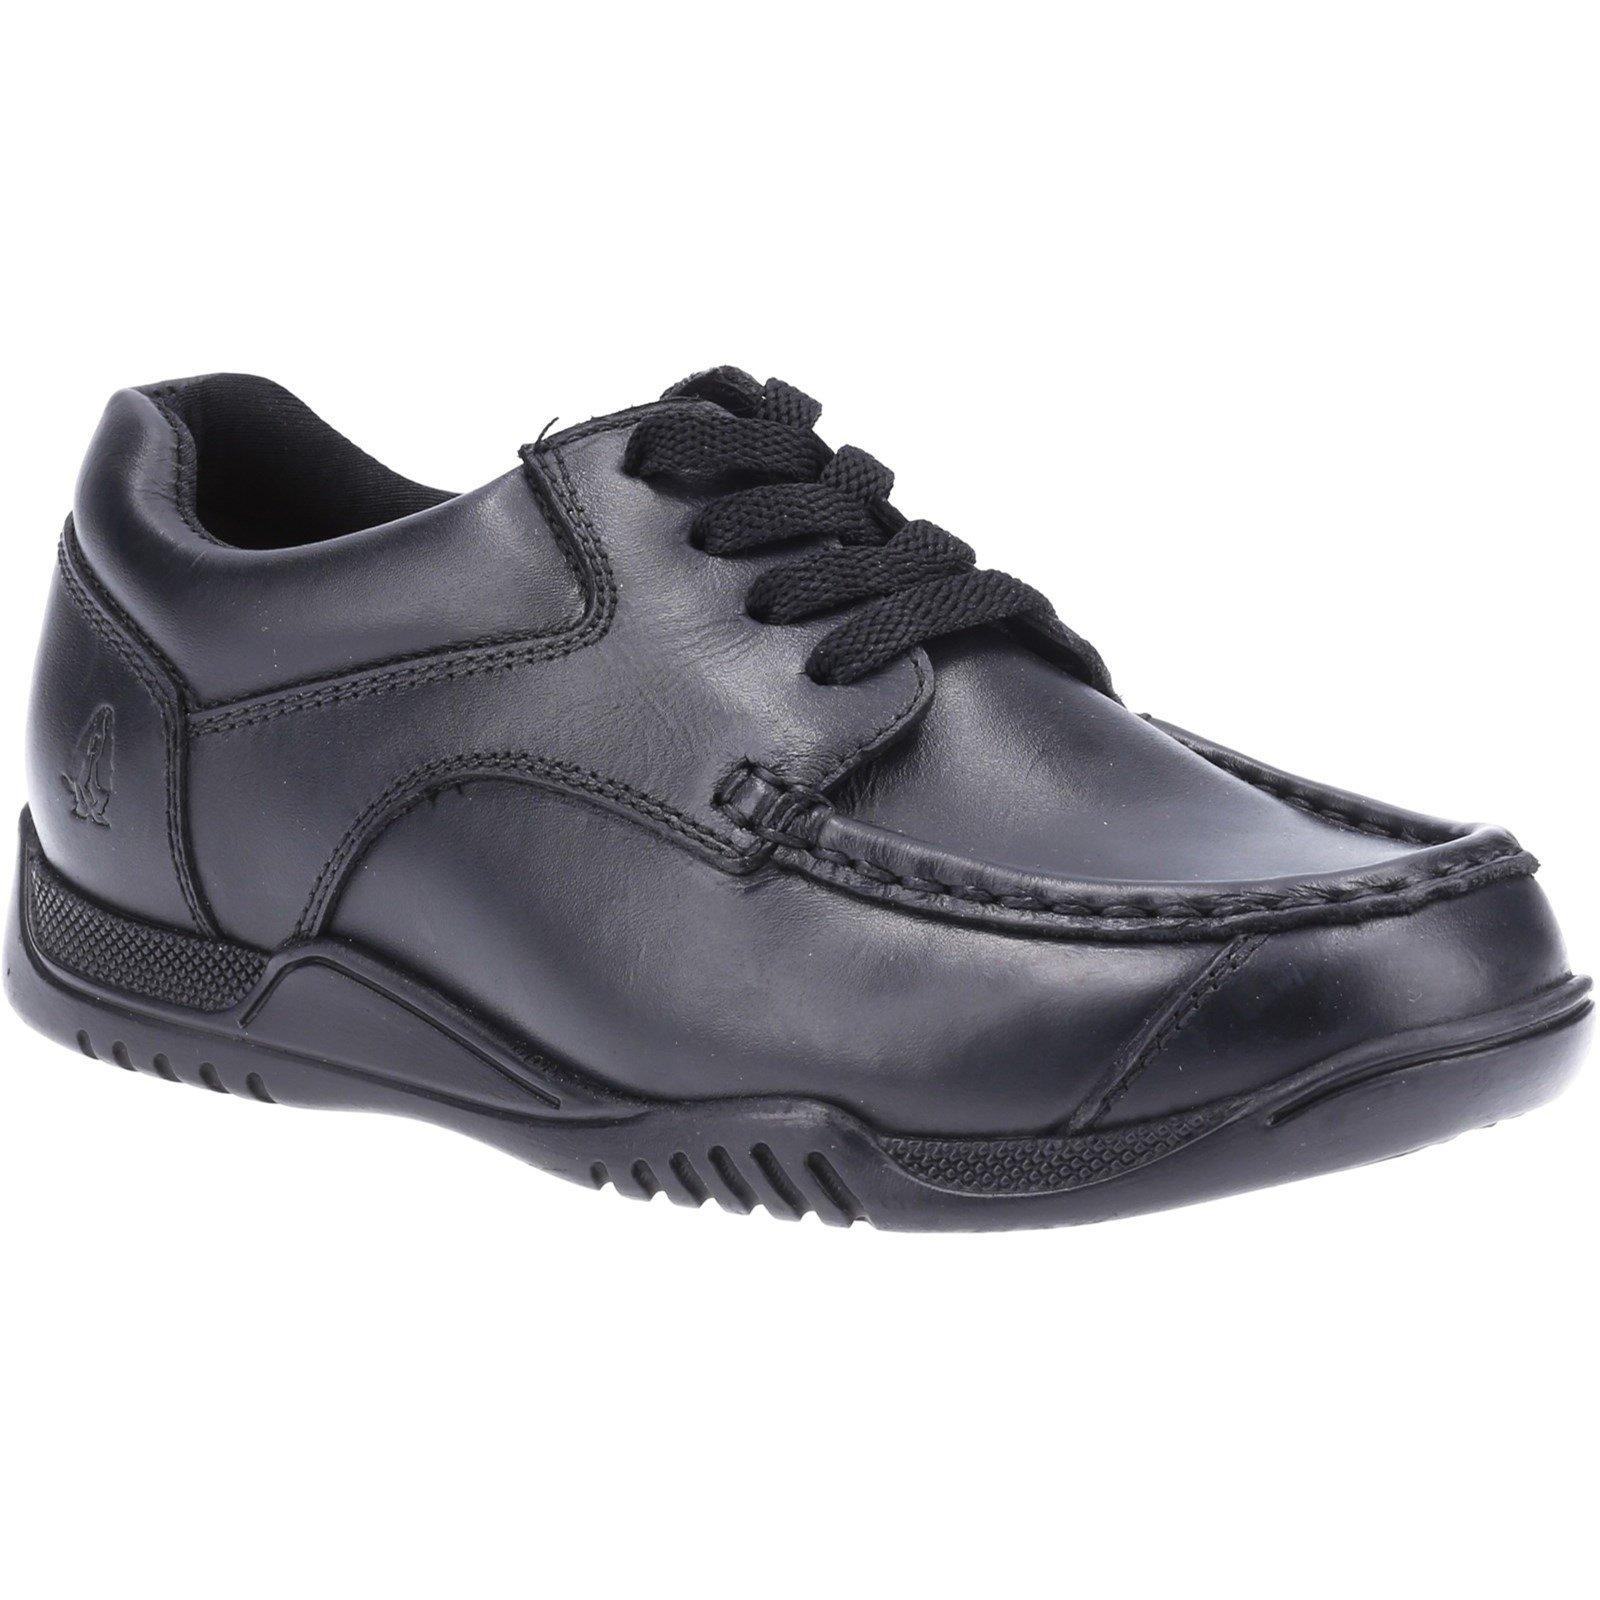 Hush Puppies Kid's Hudson Junior School Shoe Black 32582 - Black 2